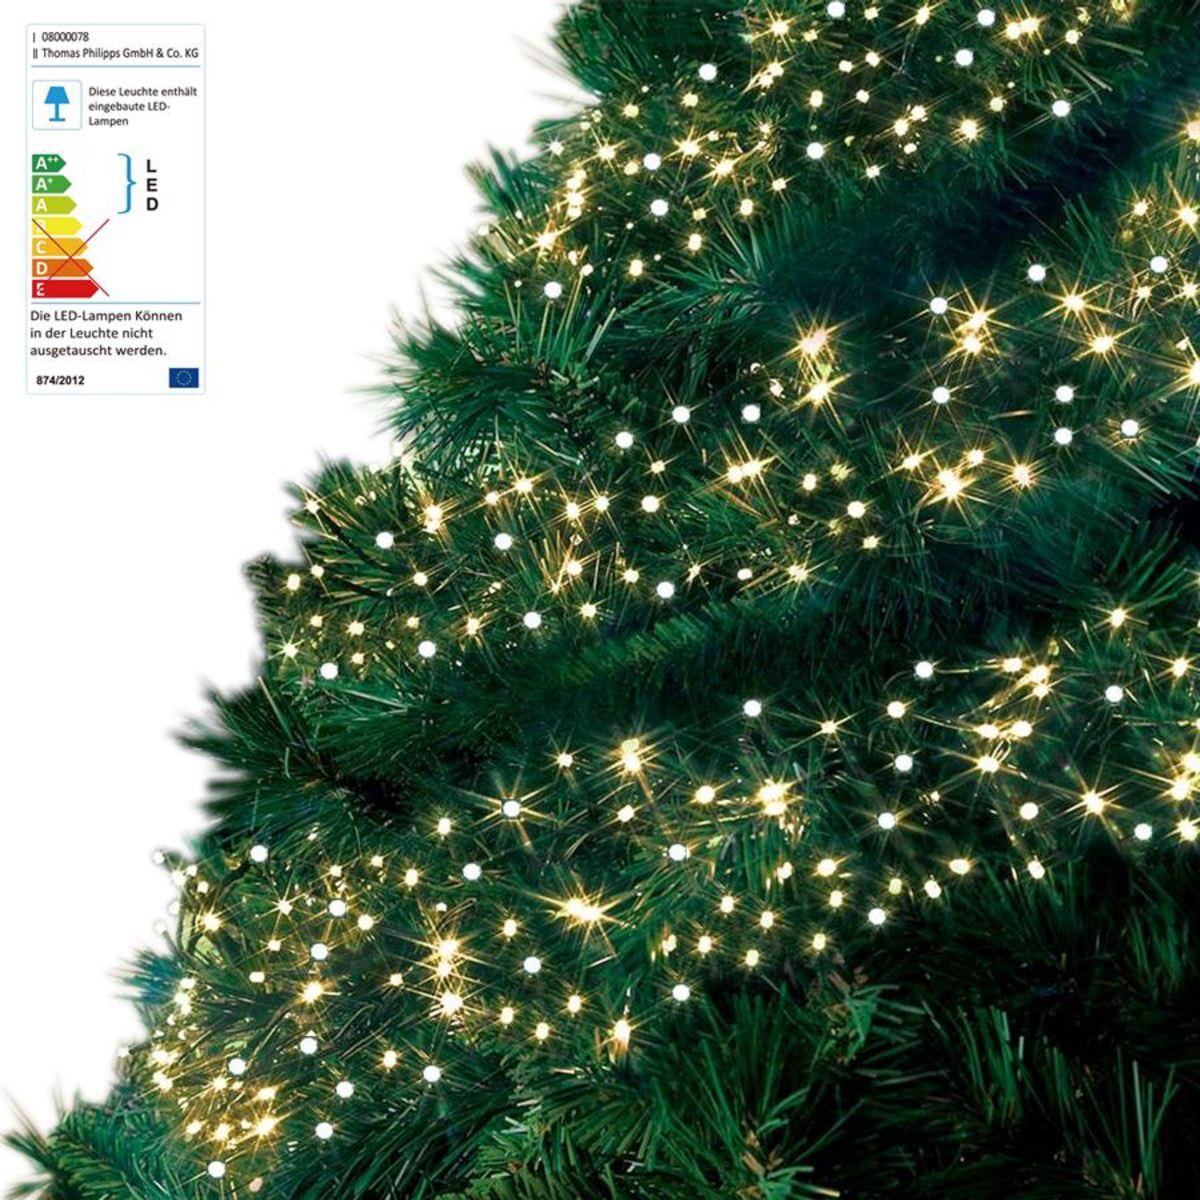 Bild 1 von LED-Cluster-Lichterkette 1152 LEDs